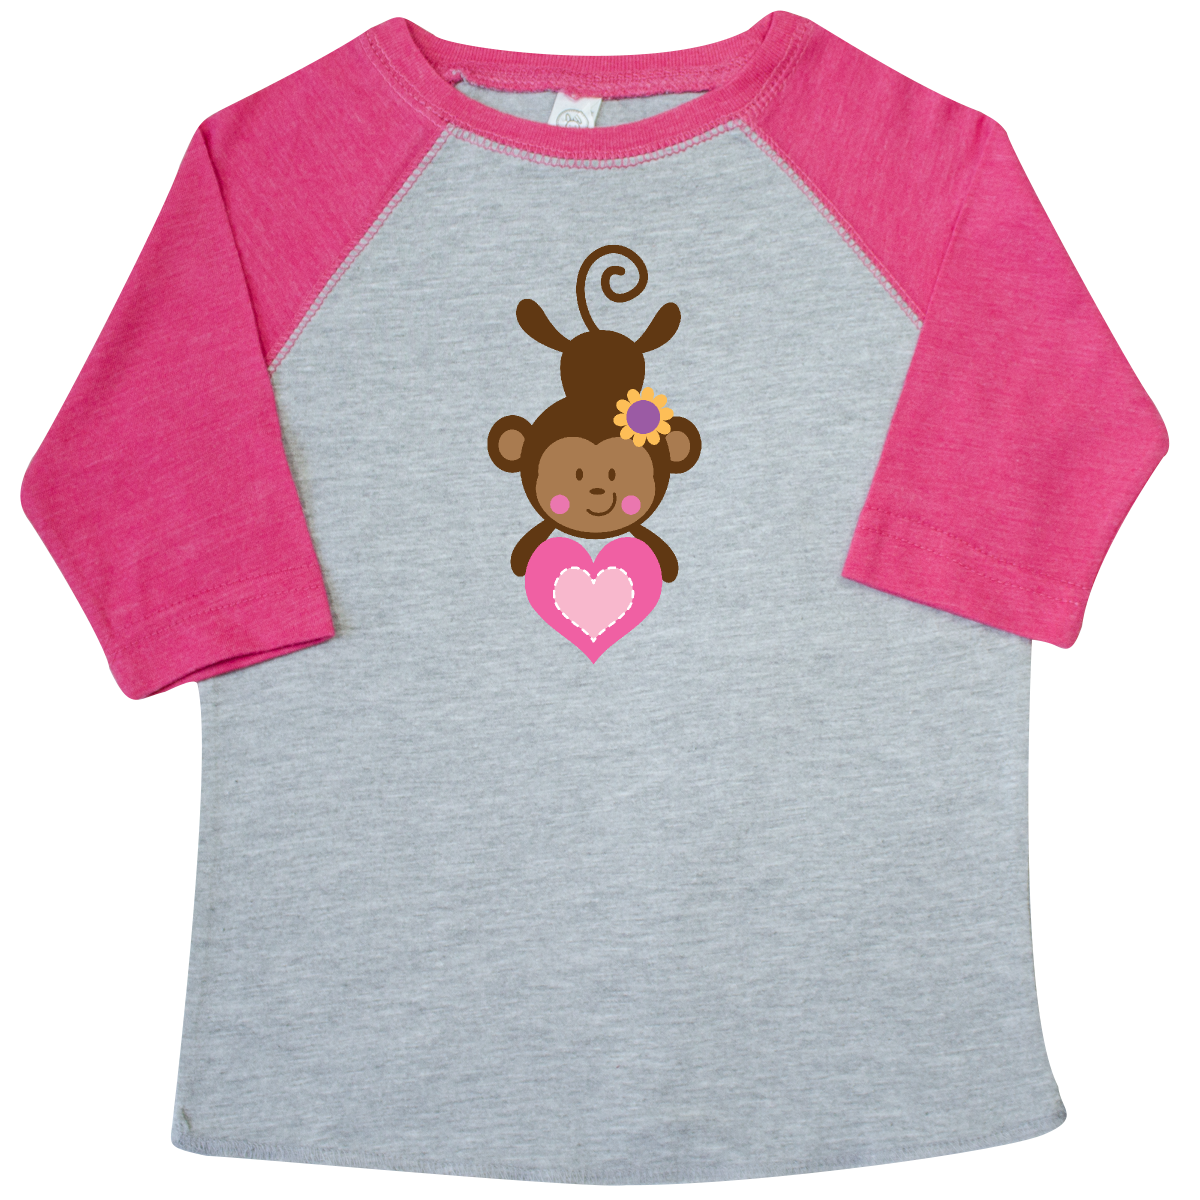 inktastic Valentine Heart Monkey Toddler T-Shirt